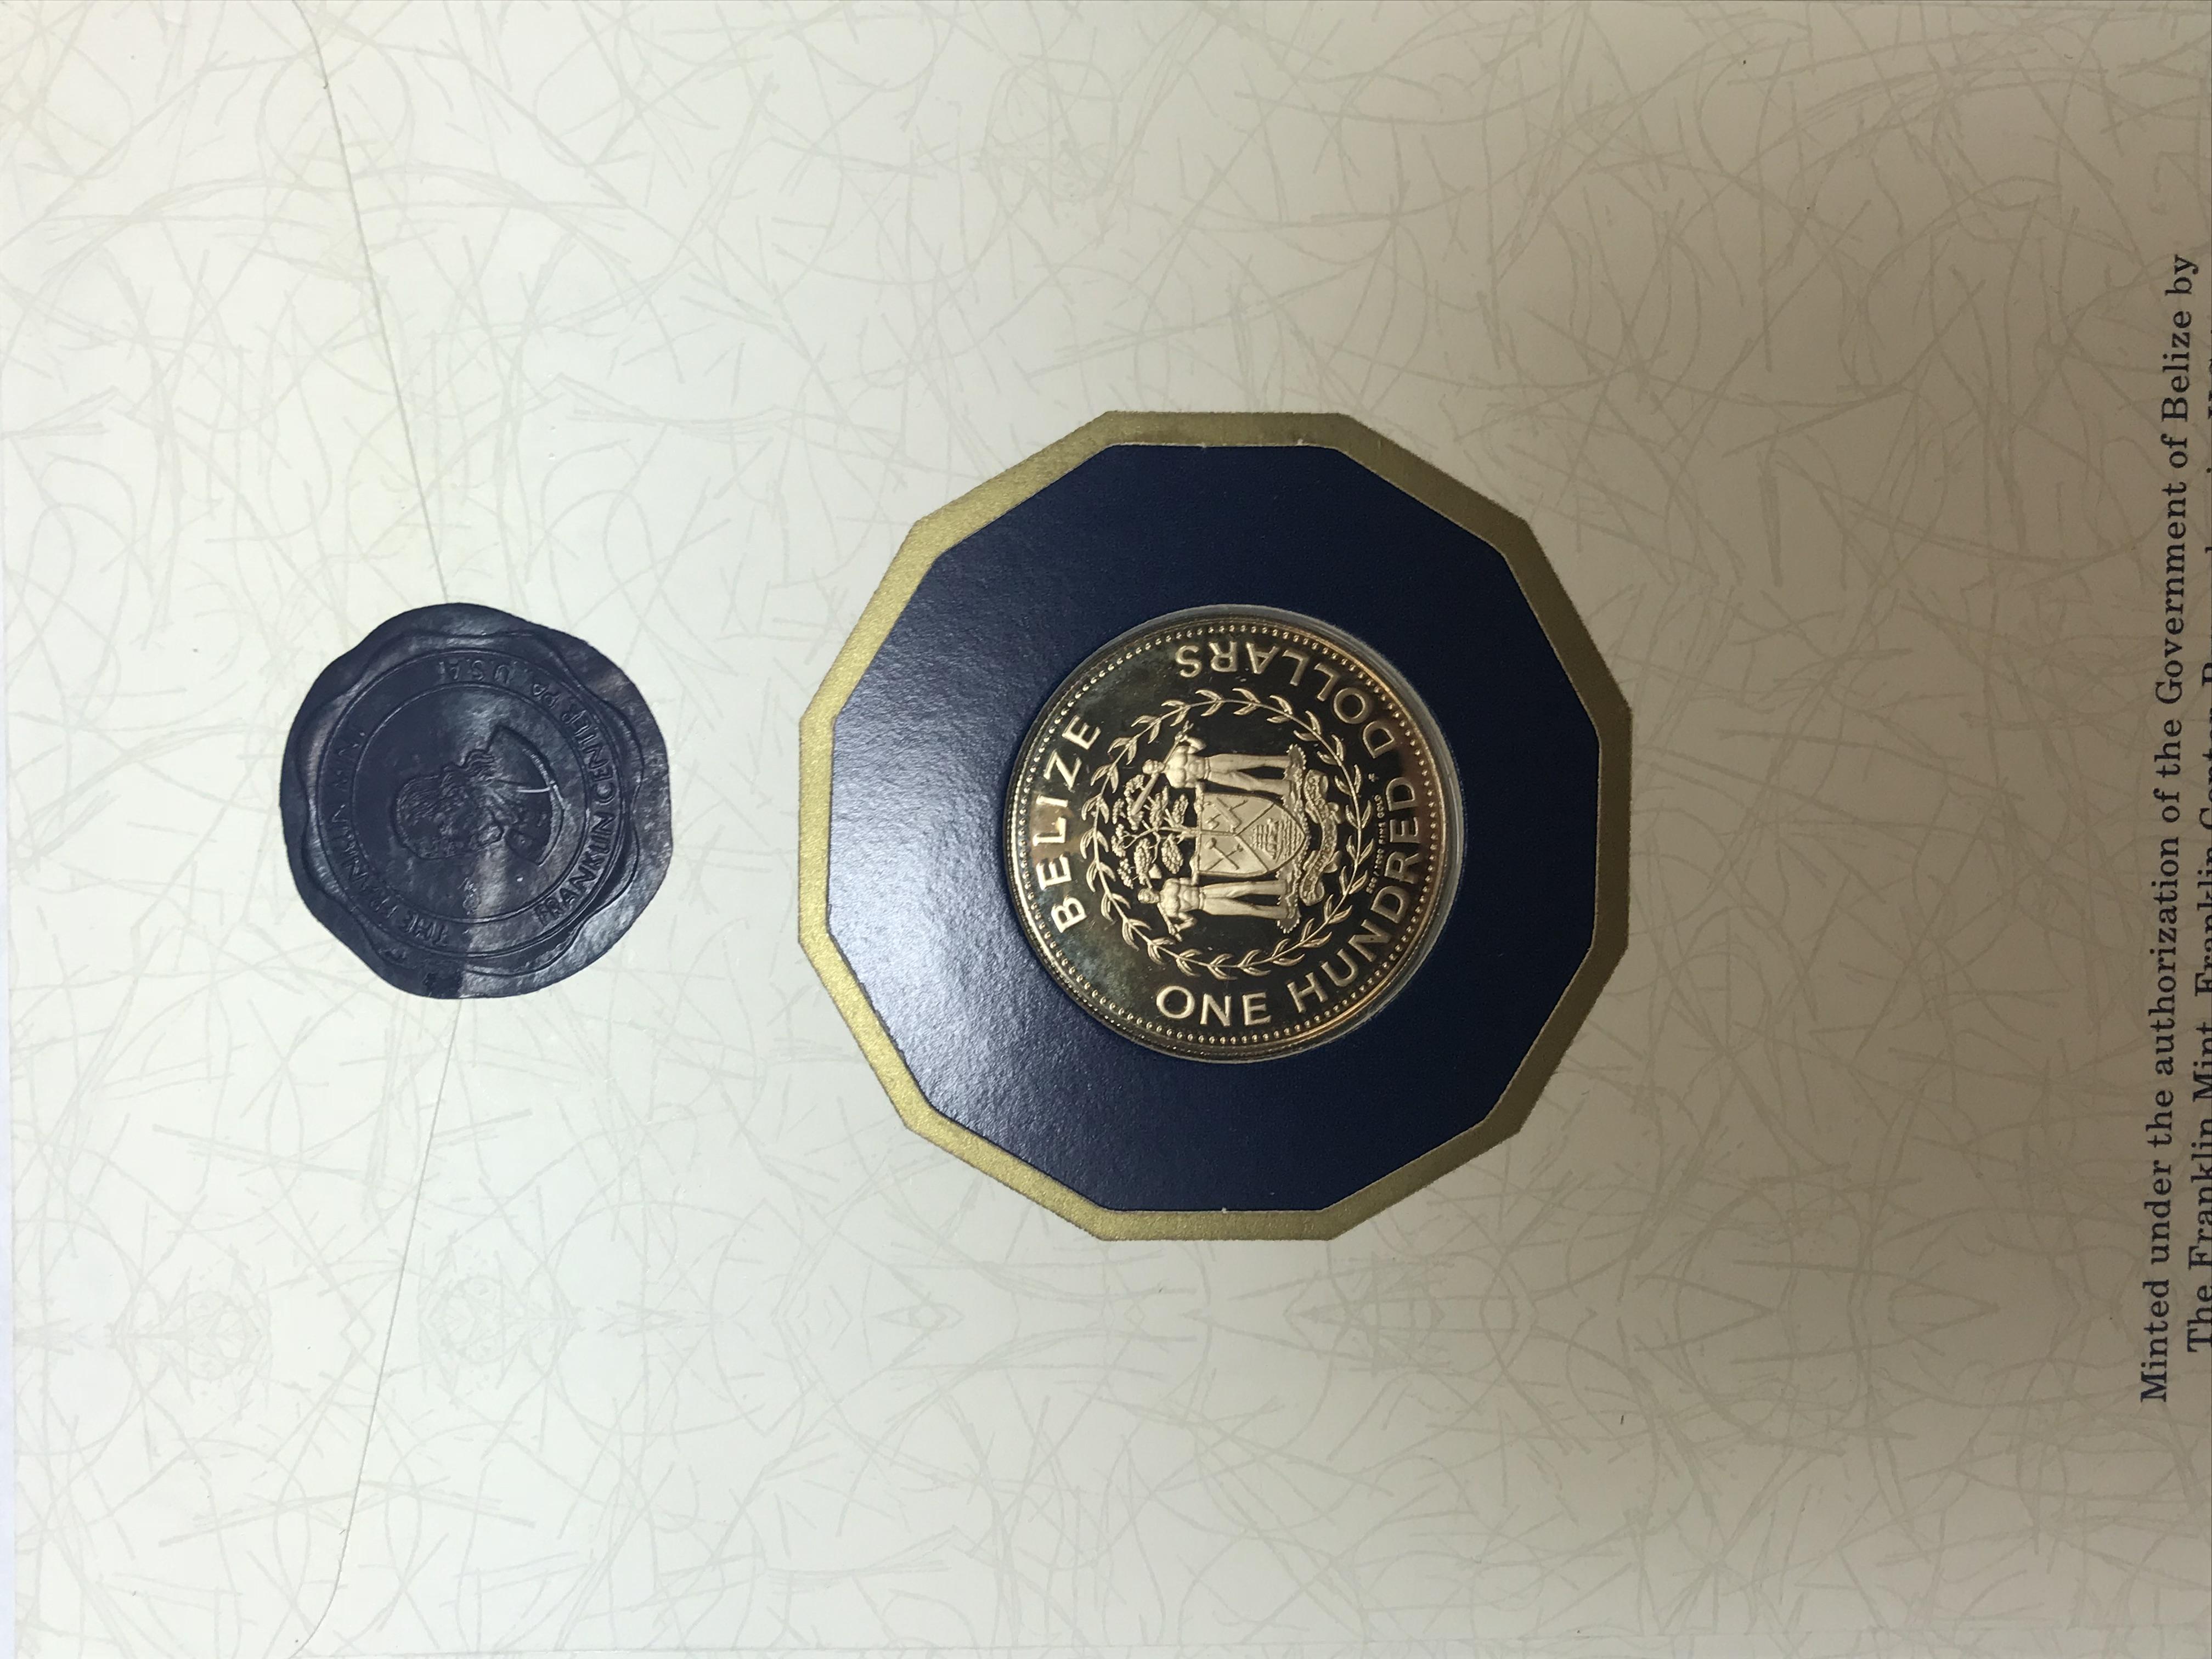 Rare 1985 Ocelot Cat Belize 6 21 Gram $100 Gold Coin - Only